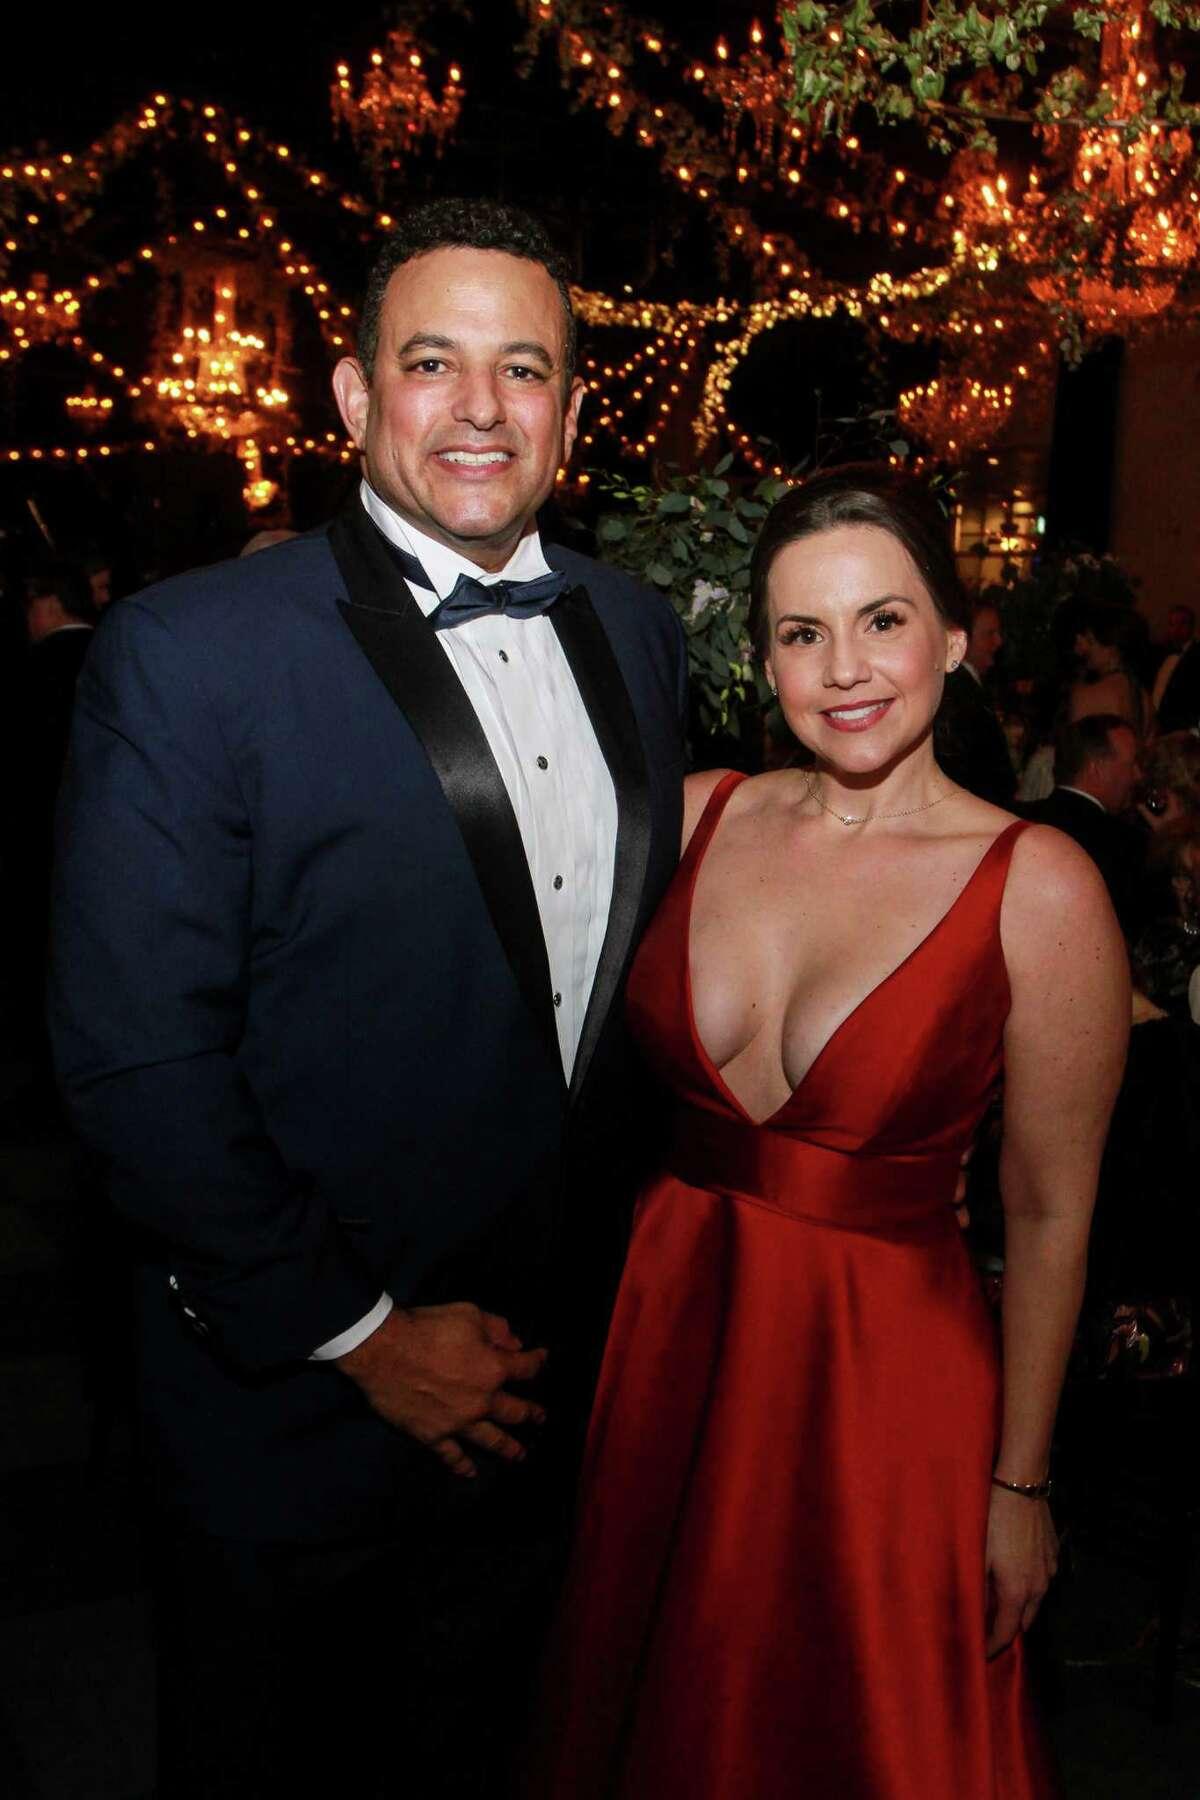 Damon Chargois and Rebekka Peltzman at the Society for the Performing Arts Gala.